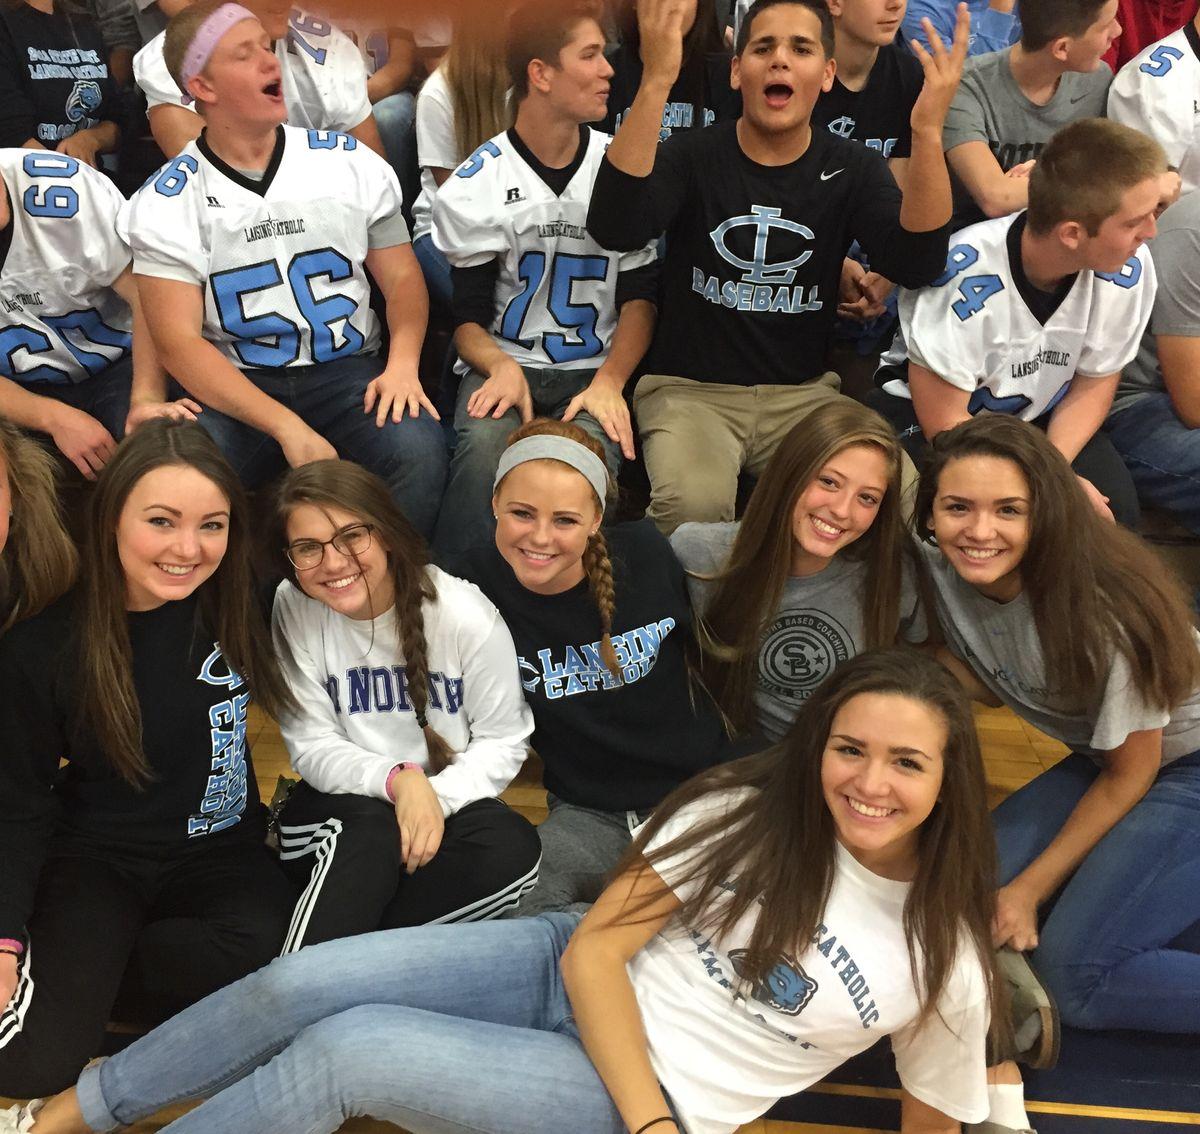 10 Reasons Why I Miss My Catholic High School